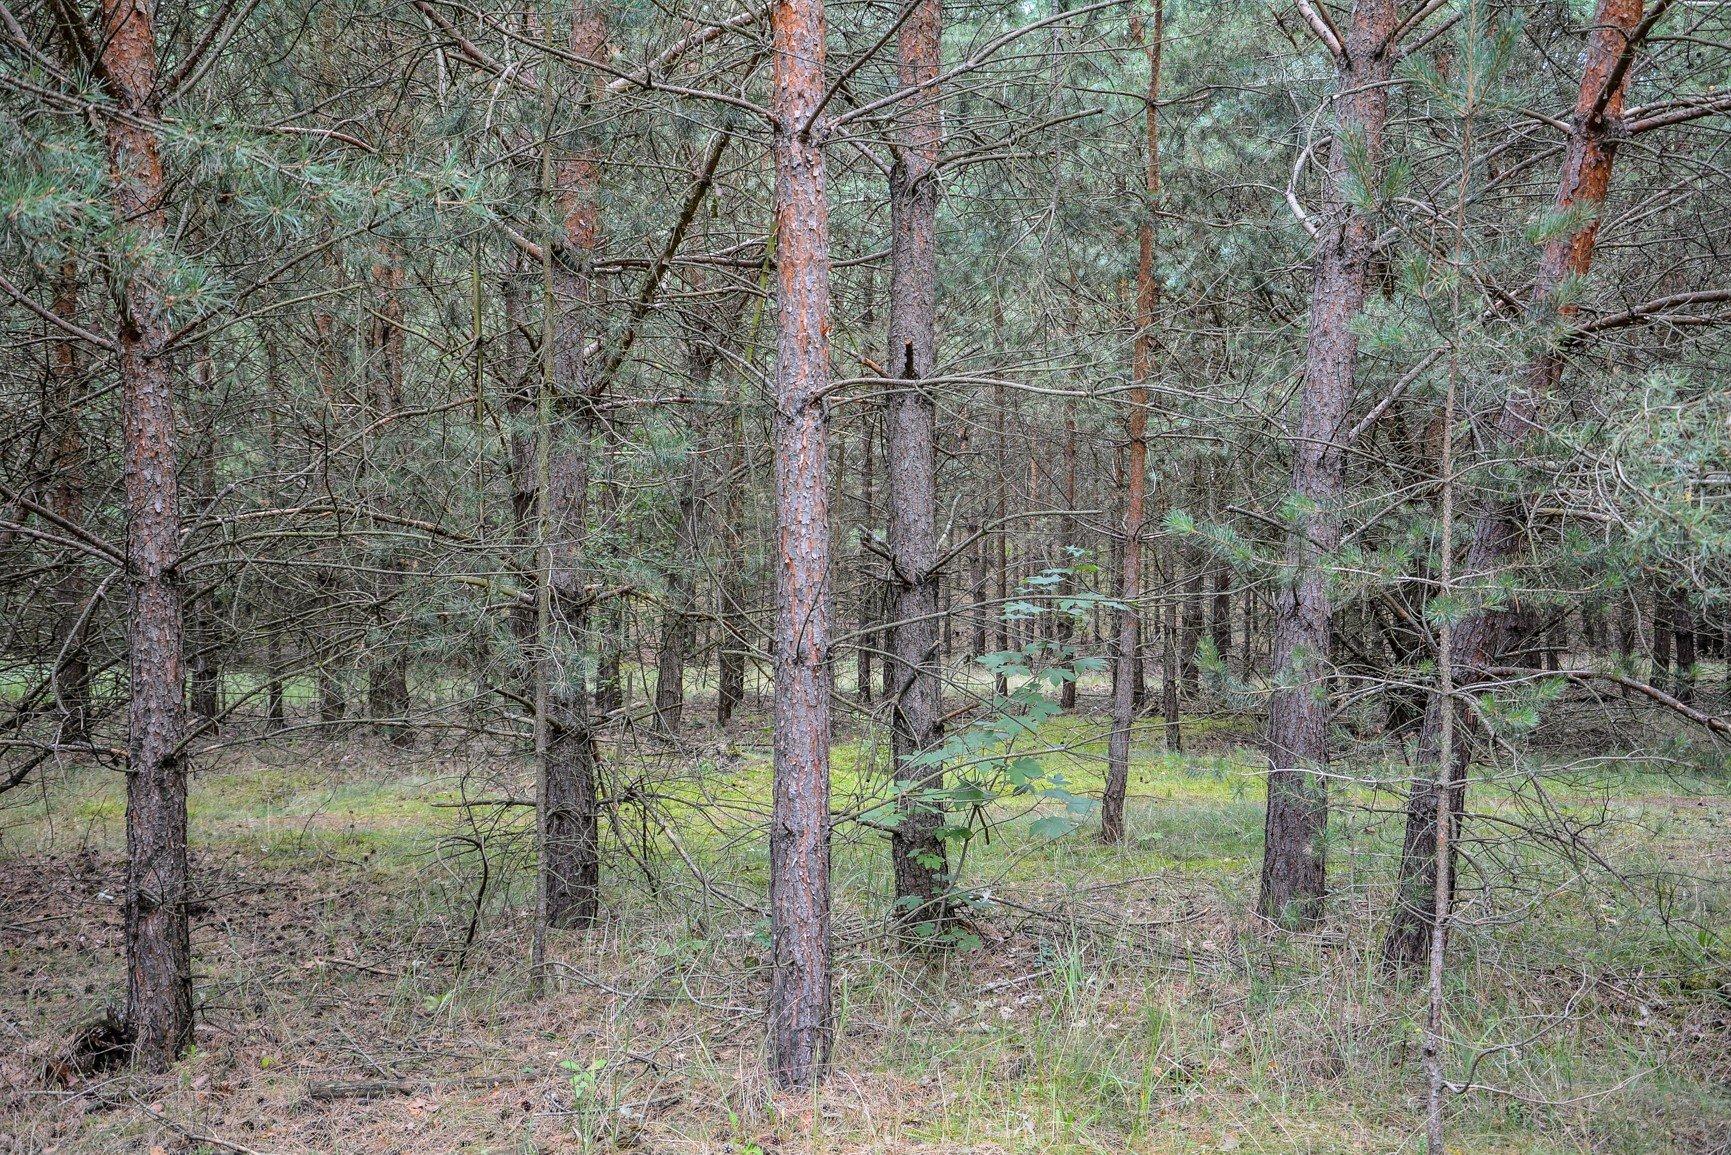 trees keerans range avus südkurve hügel hill berlin charlottenburg lost places urbex abandoned berlin